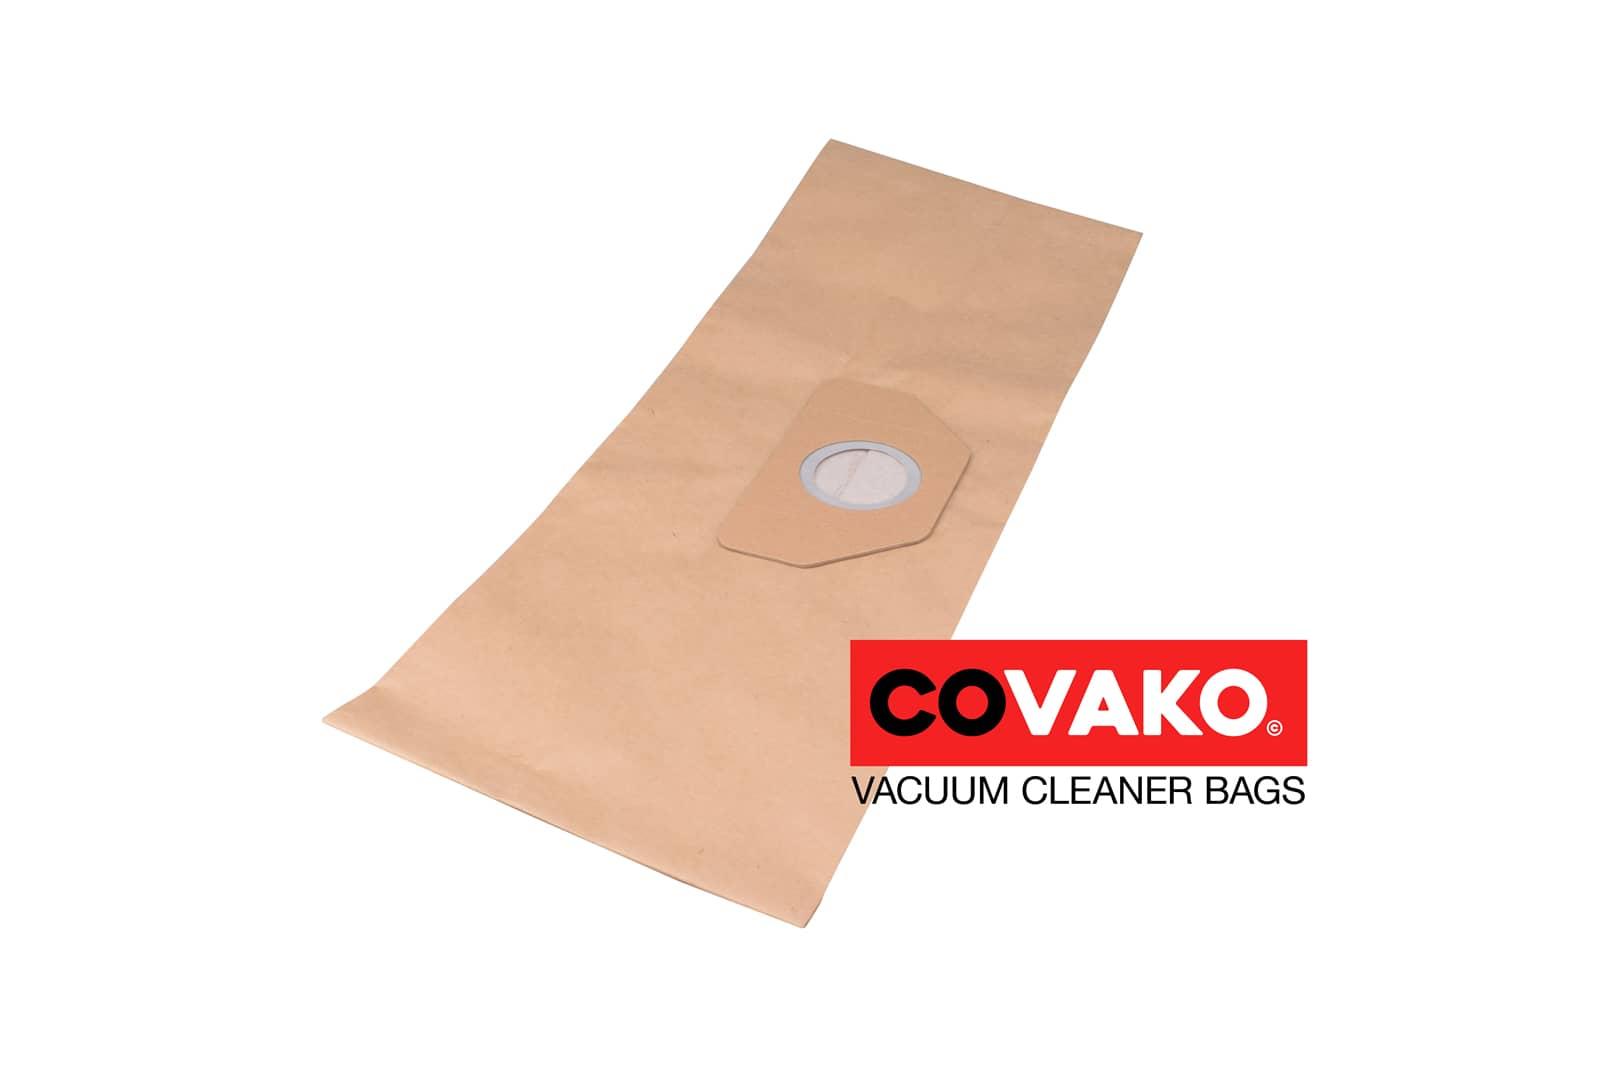 Kärcher A 2200 / Papier - Kärcher stofzuigerzakken